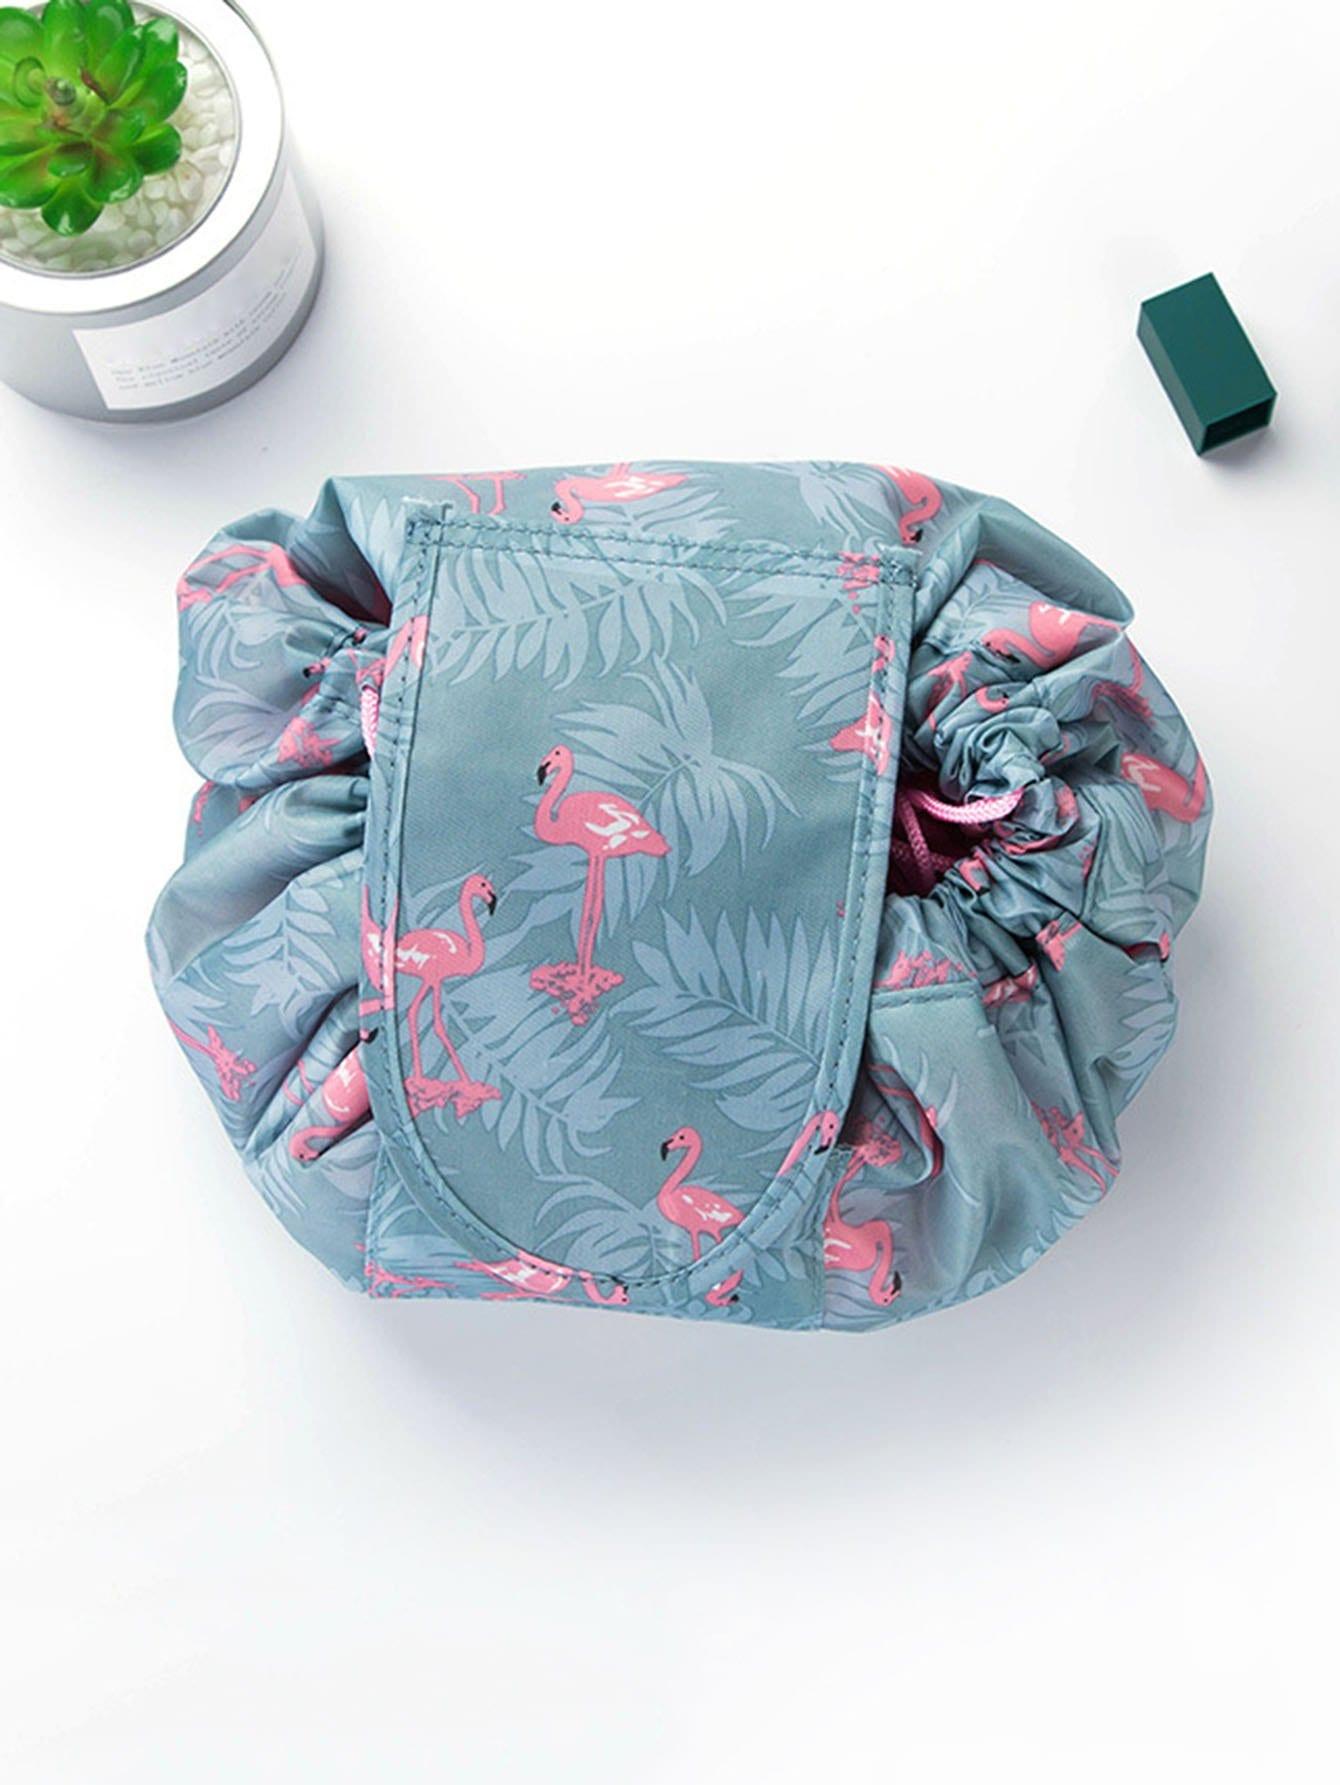 Flamingo Drawstring Wrap Around Makeup Bag drawstring wrap around makeup bag